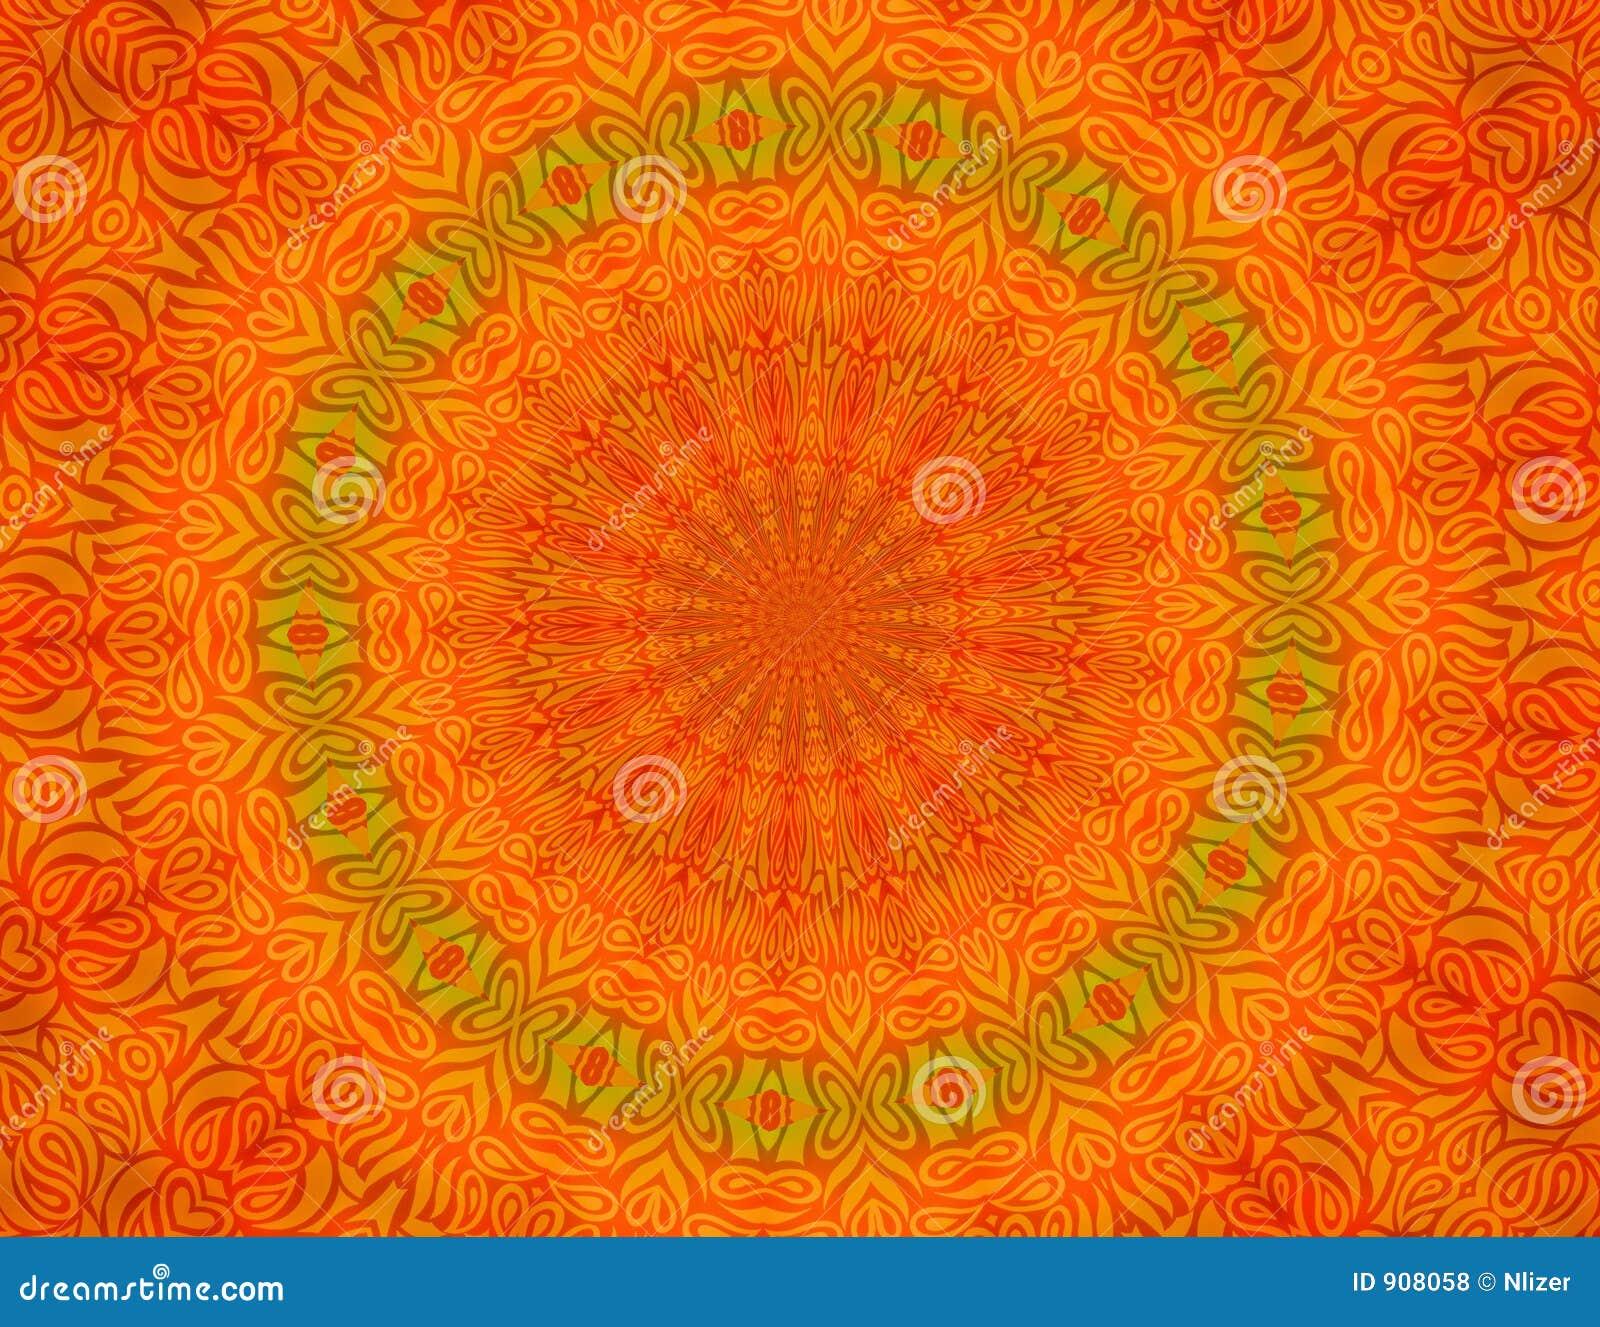 papier peint orange de fond de batik illustration stock. Black Bedroom Furniture Sets. Home Design Ideas